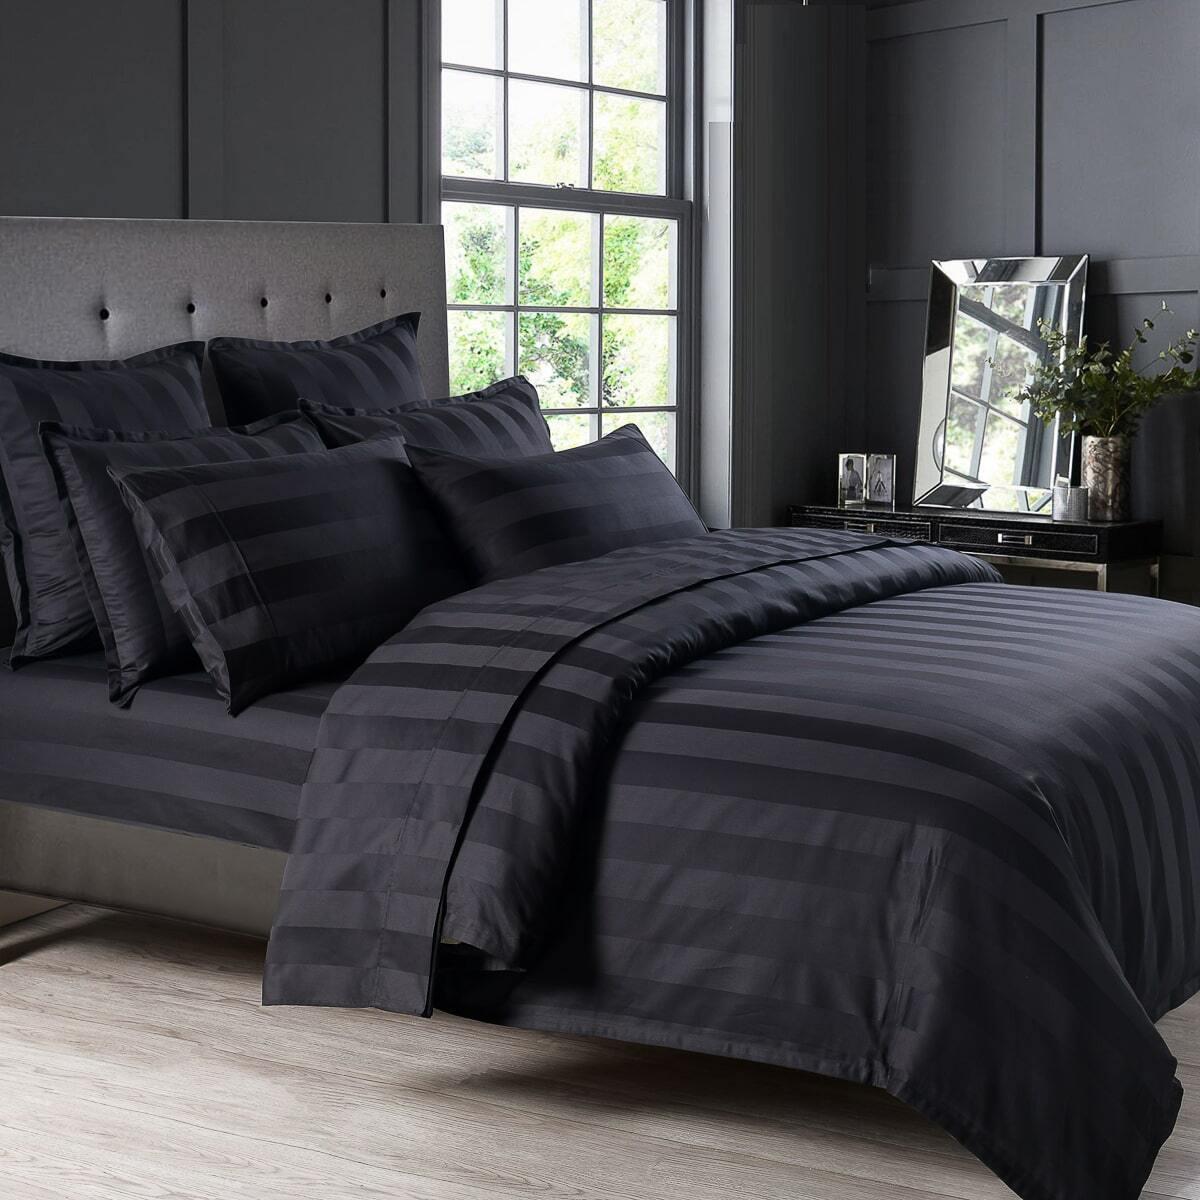 Bespoke 1200TC Sheet Set Black Super Queen Bed